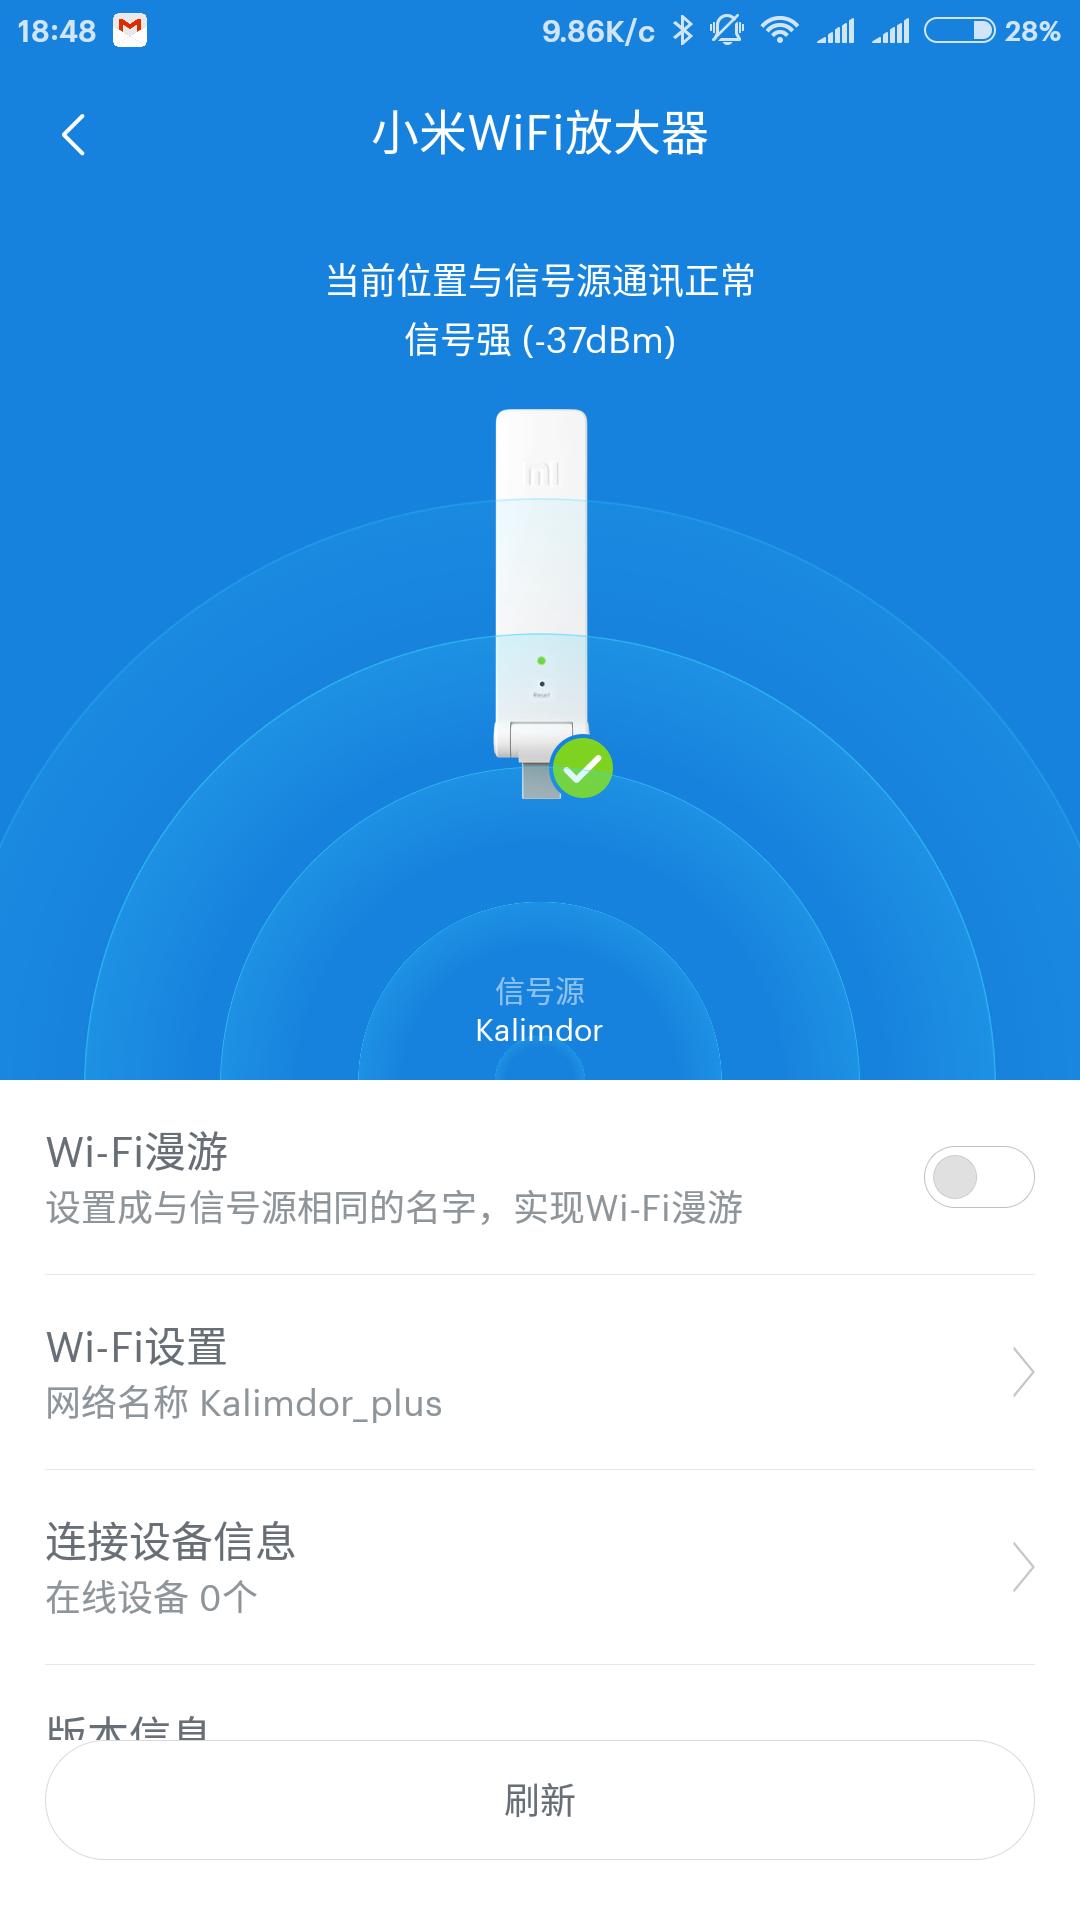 GearBest: Еще раз о расширителе зоны wi fi от Xiaomi, настройка и подбор блока питания